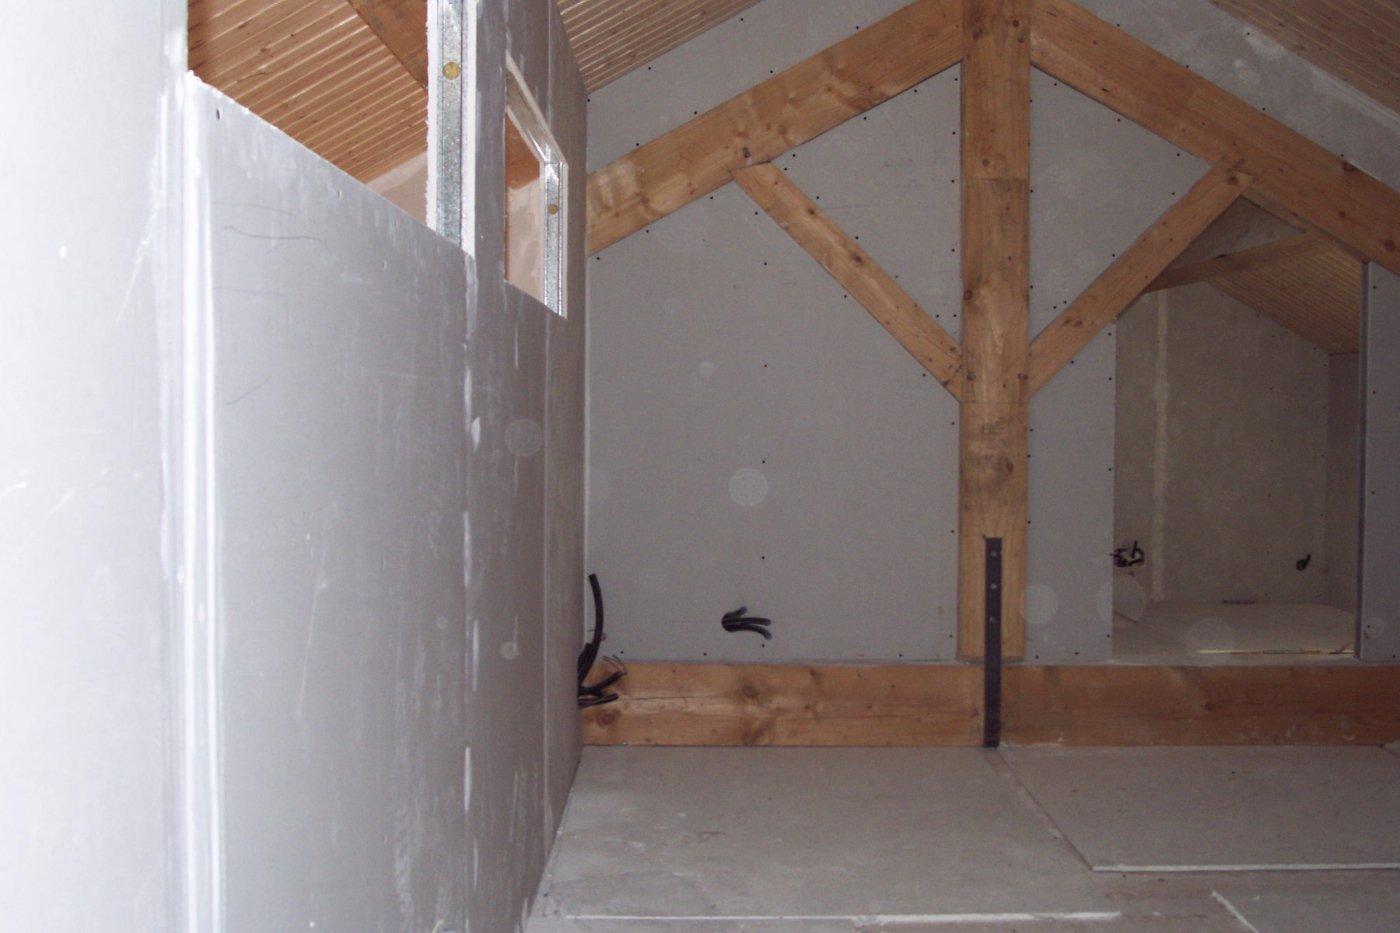 plafond plaque de pl tre sas morales. Black Bedroom Furniture Sets. Home Design Ideas